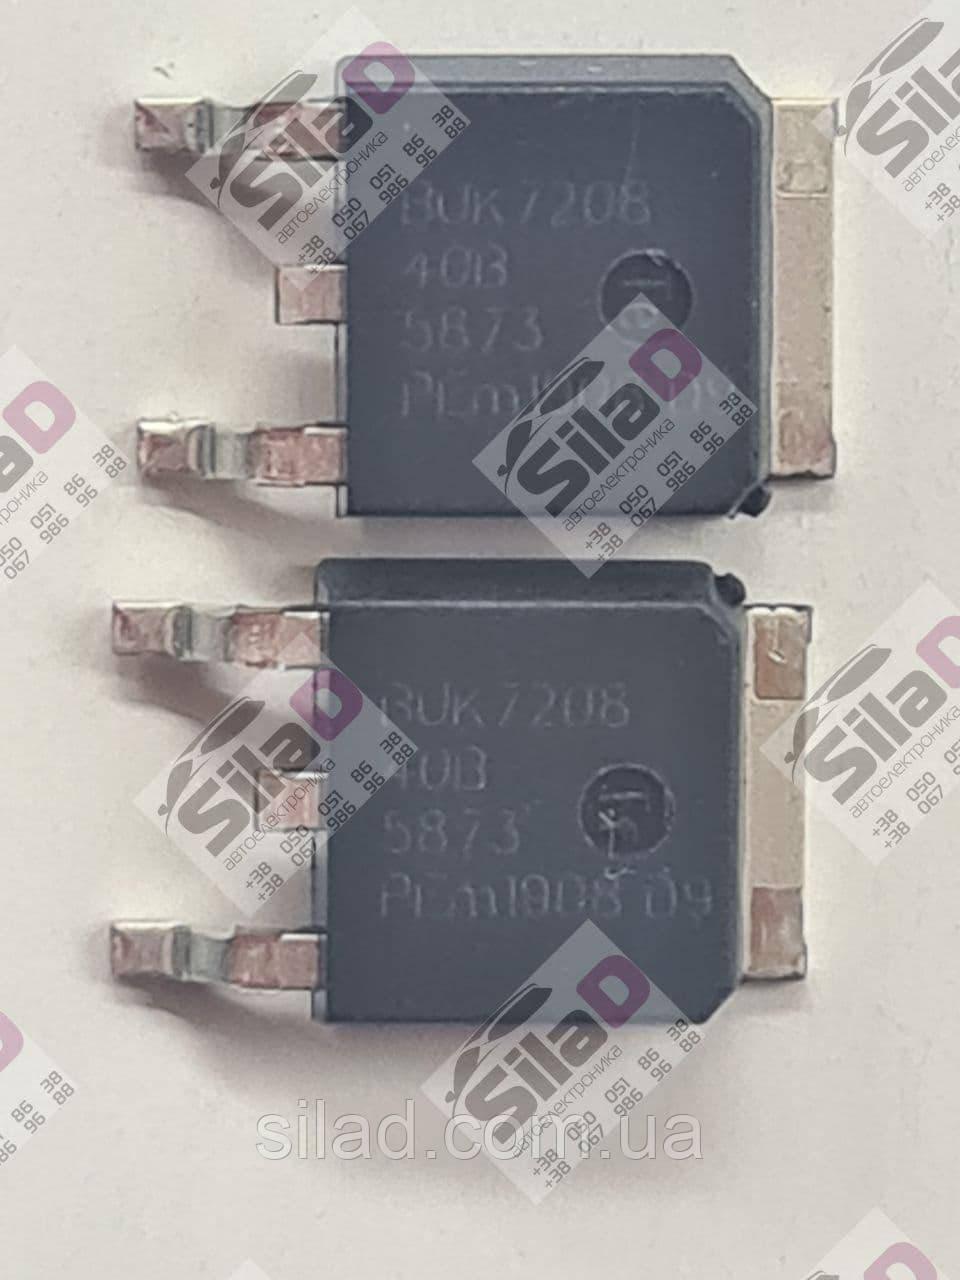 Транзистор BUK7208-40B Nexperia корпус DPAK